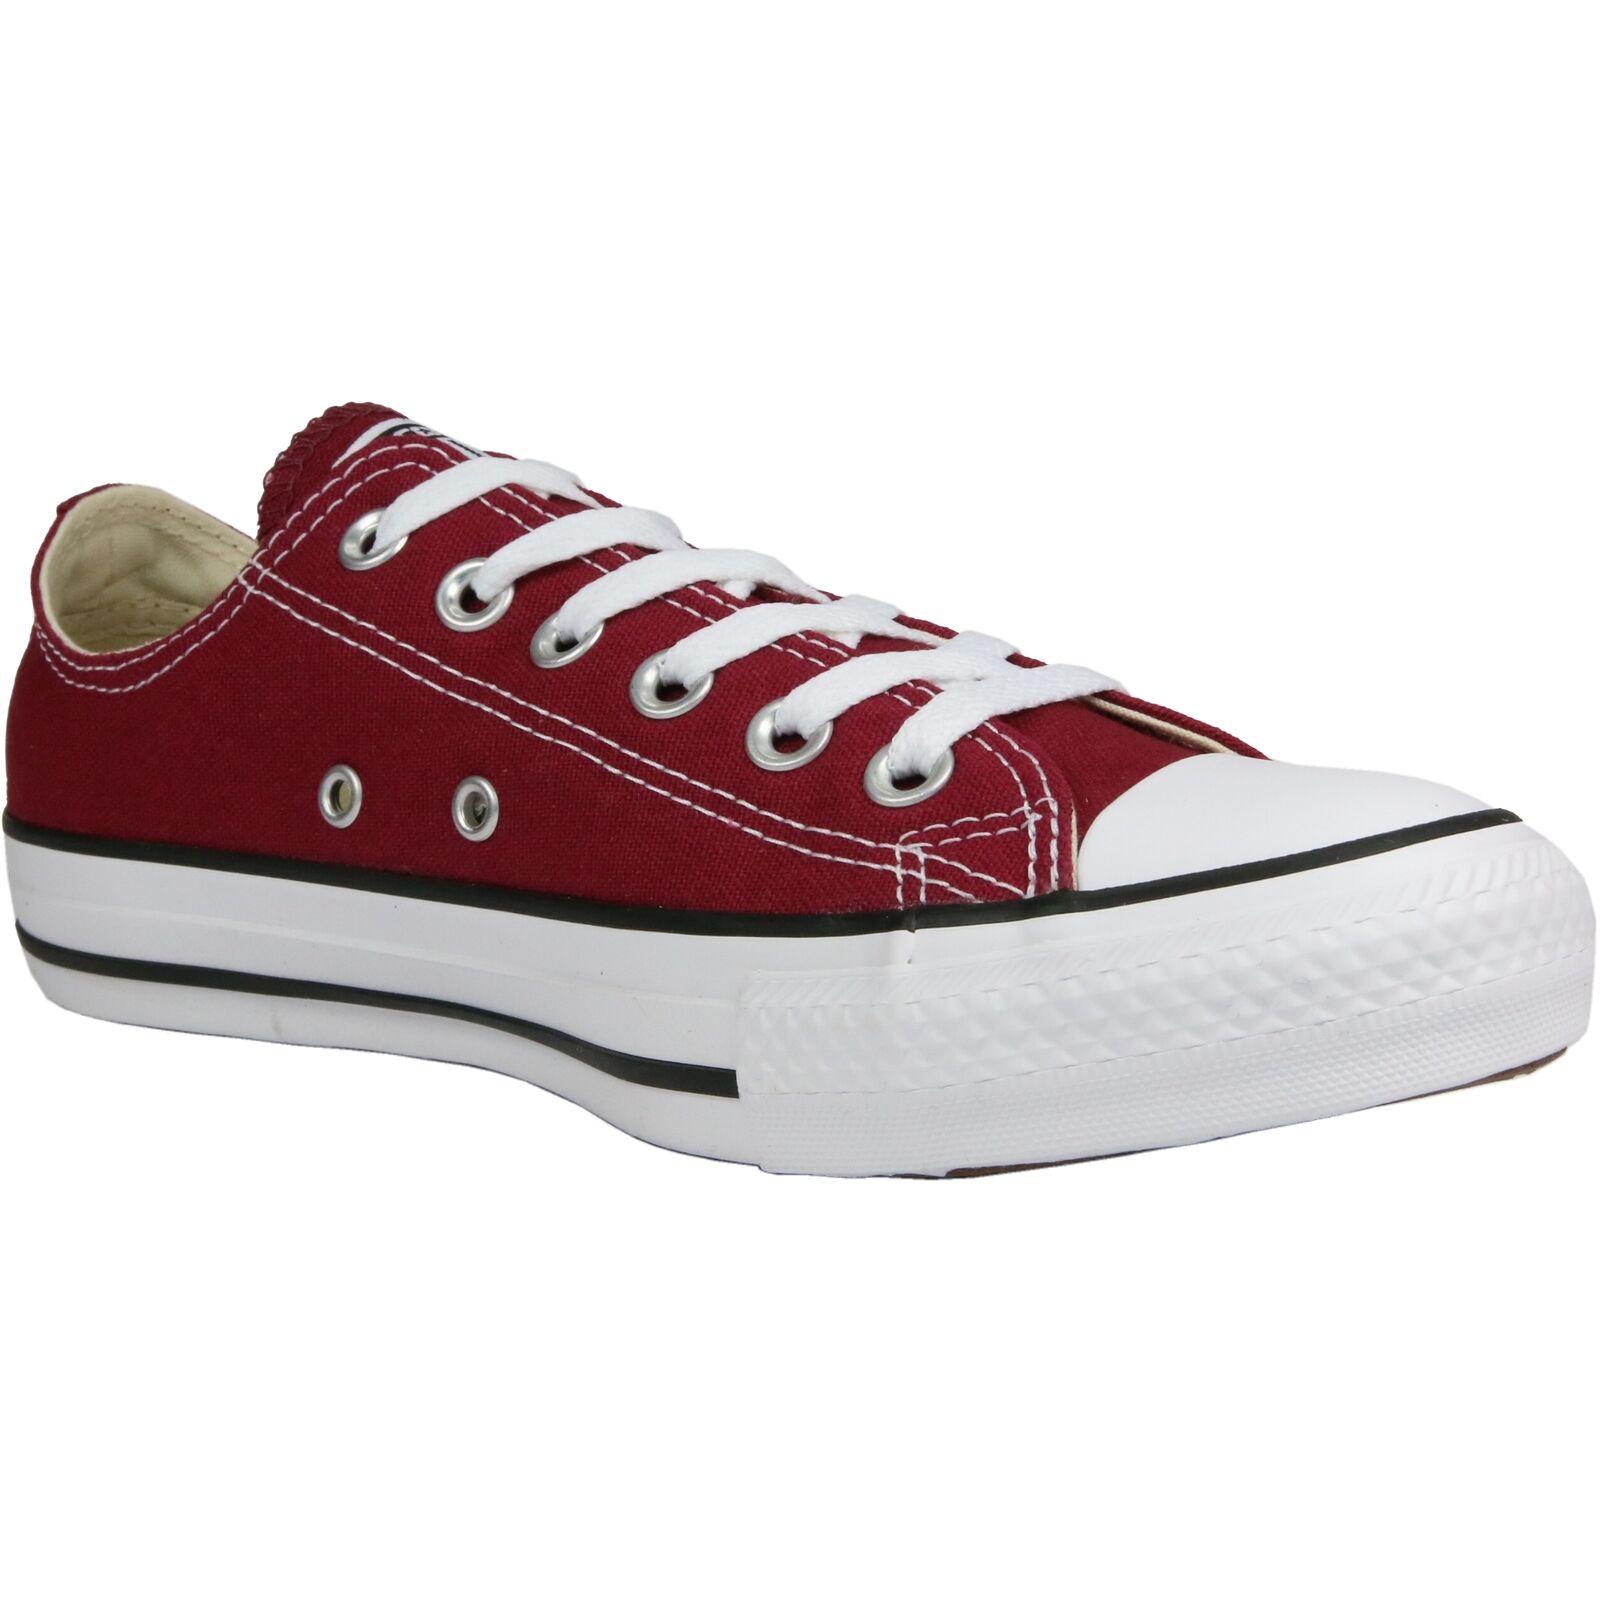 Converse Chucks All Star OX Canvas Canvas Canvas Schuhe Turnschuhe diverse Farben   a1d4e9